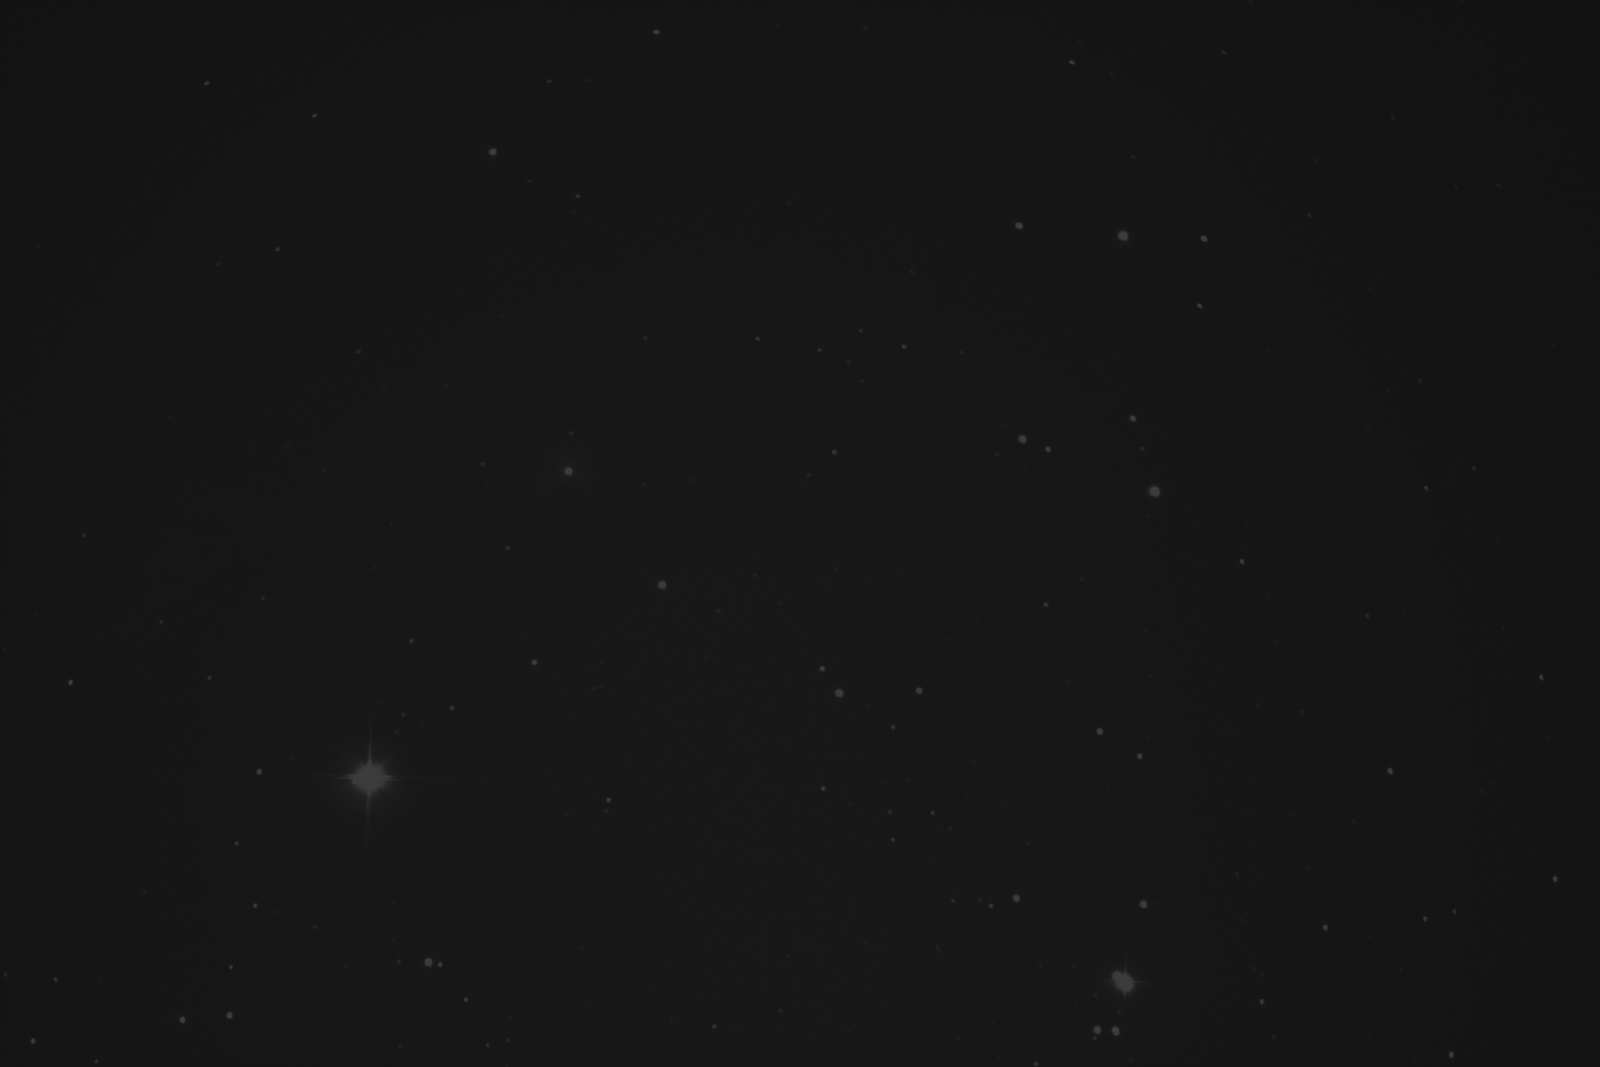 IC_434_Light_180_secs_001.thumb.jpg.021dcd6f046a0e743f430c420f1ef3f6.jpg